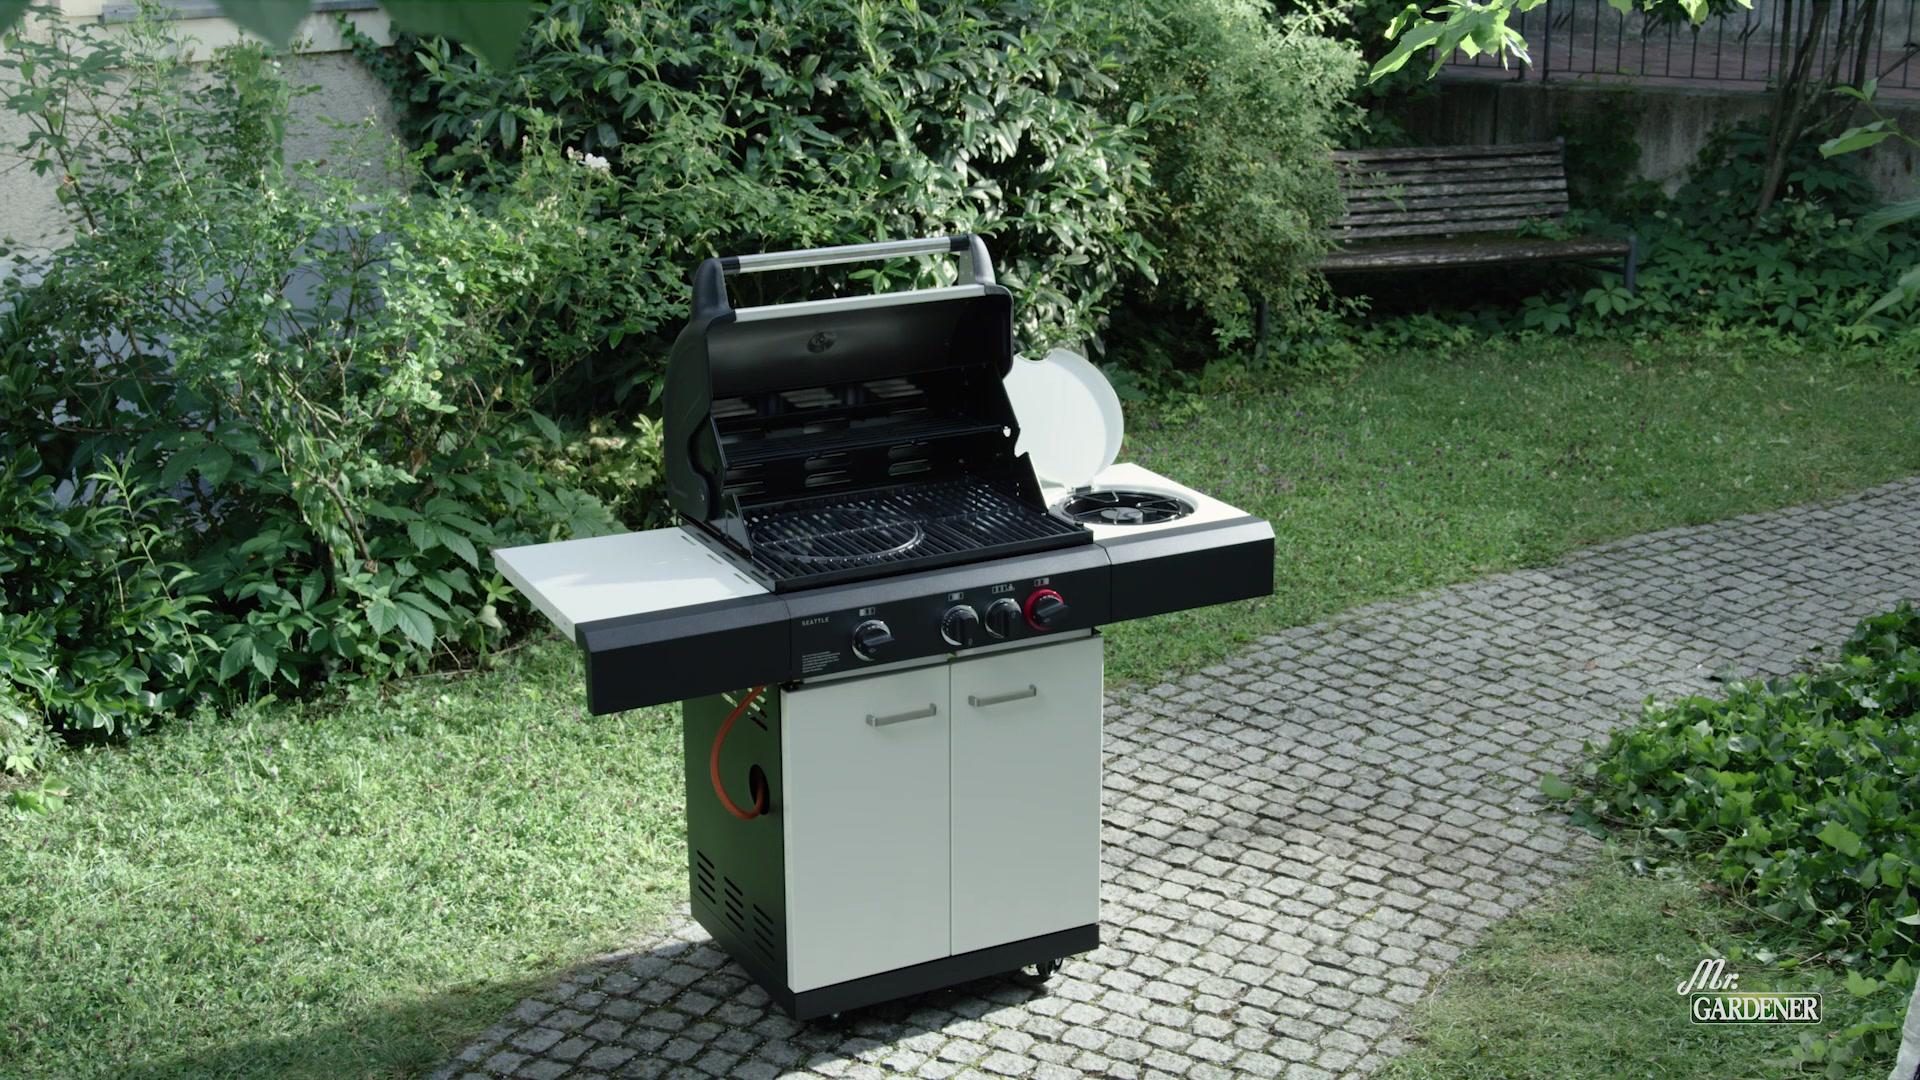 Enders Gasgrill Hagebau : Gasflasche für gasgrill hagebau hagebau weber grill amazing with